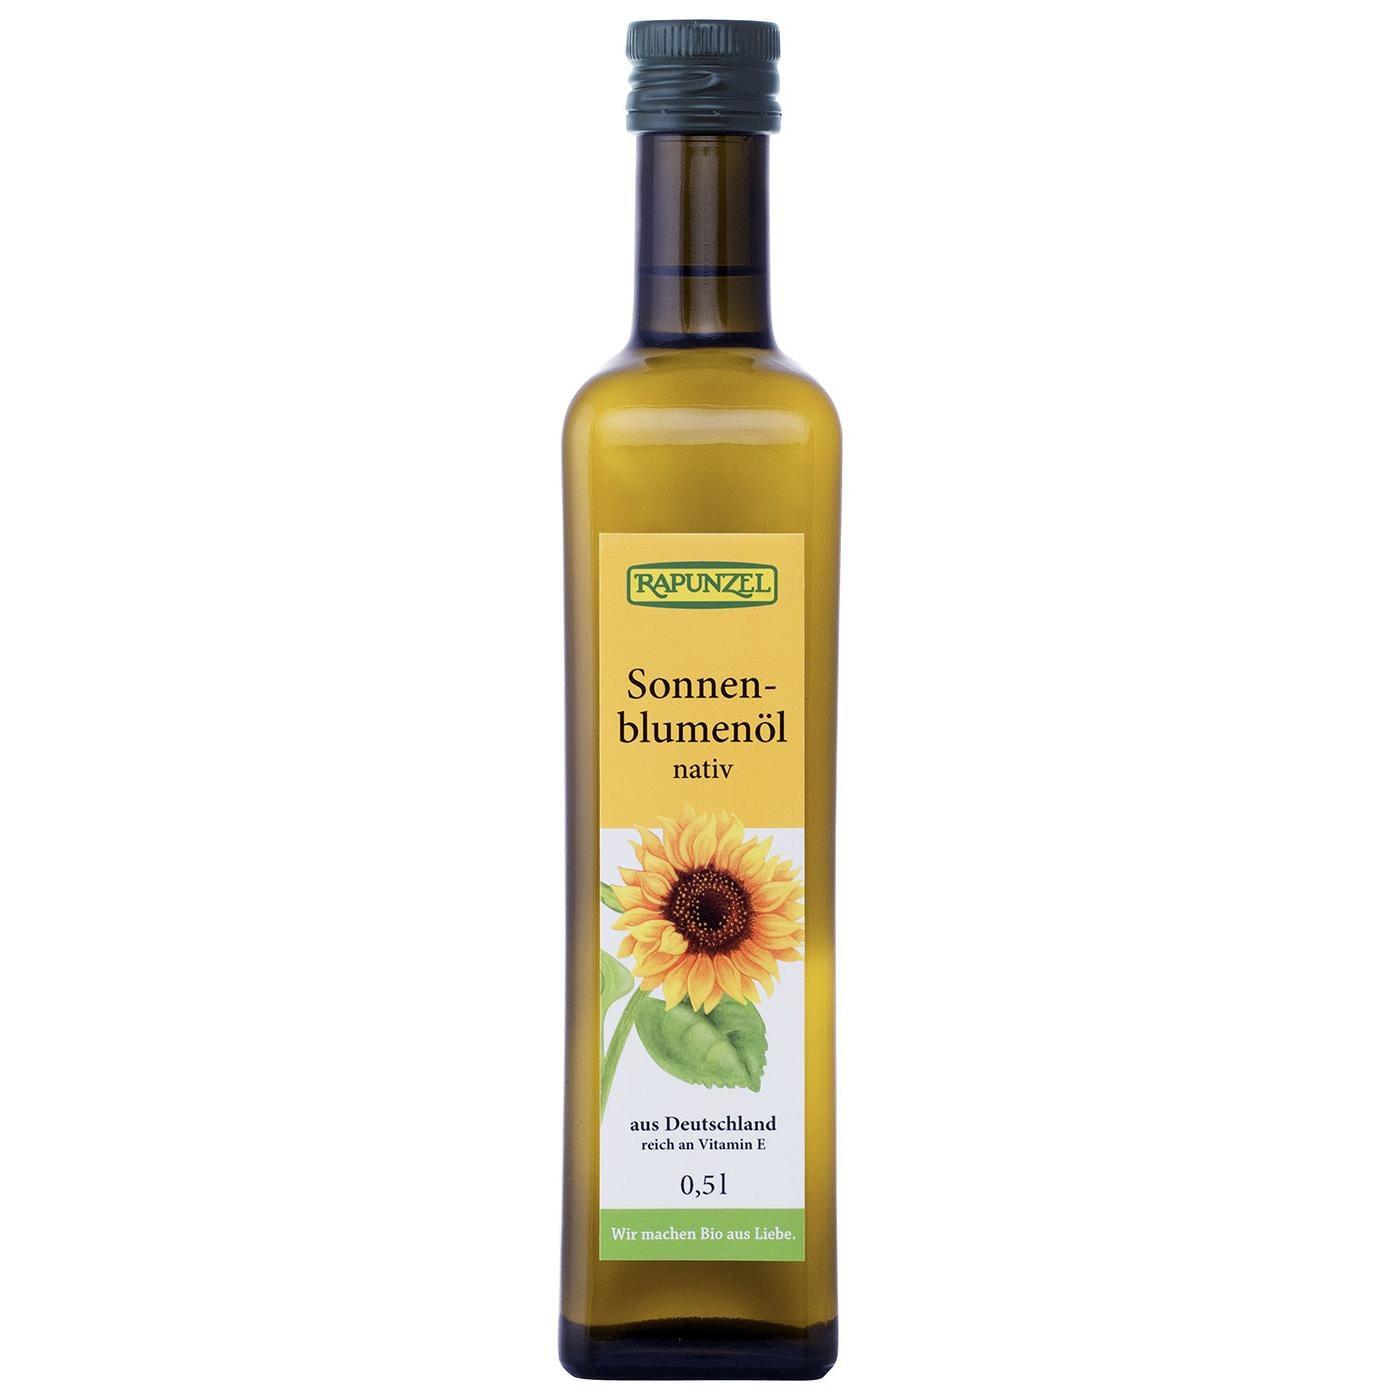 Rapunzel Bio Sonnenblumenöl nativ 0,5l